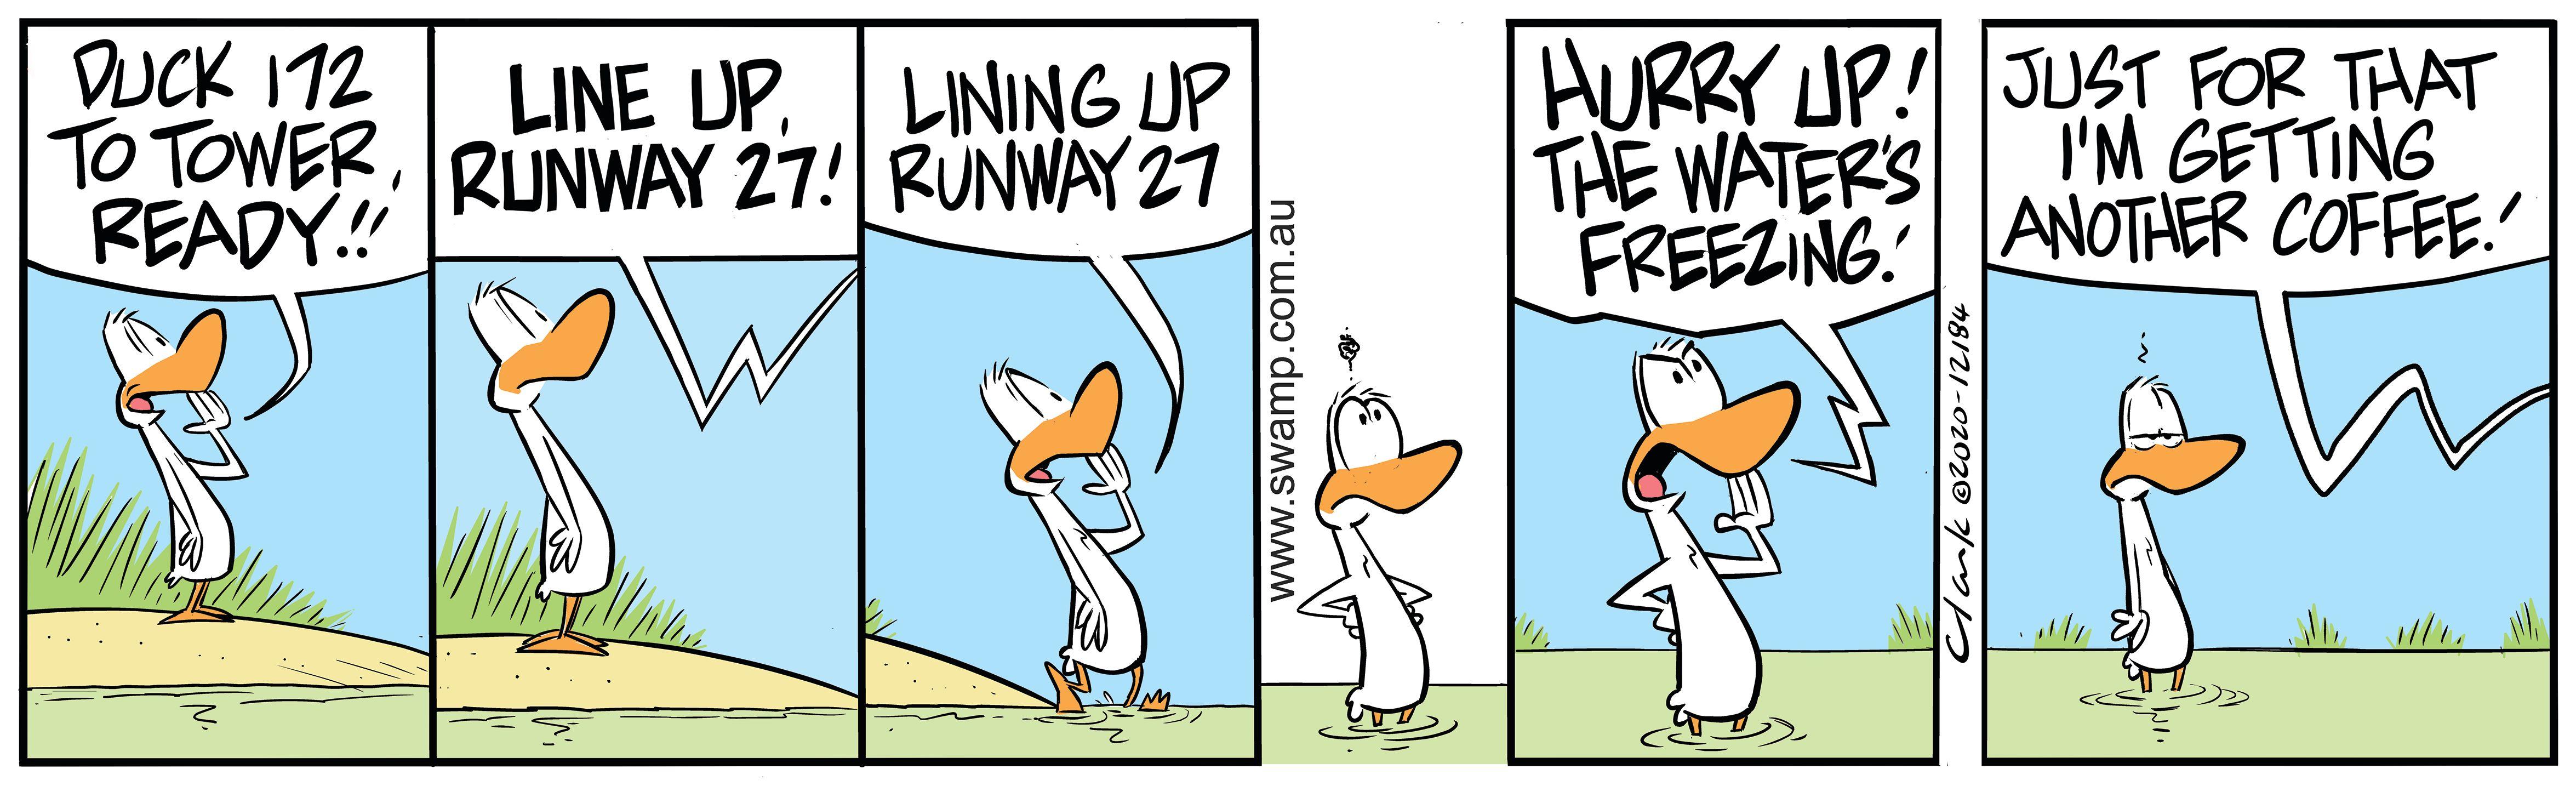 Lining up Runway 27